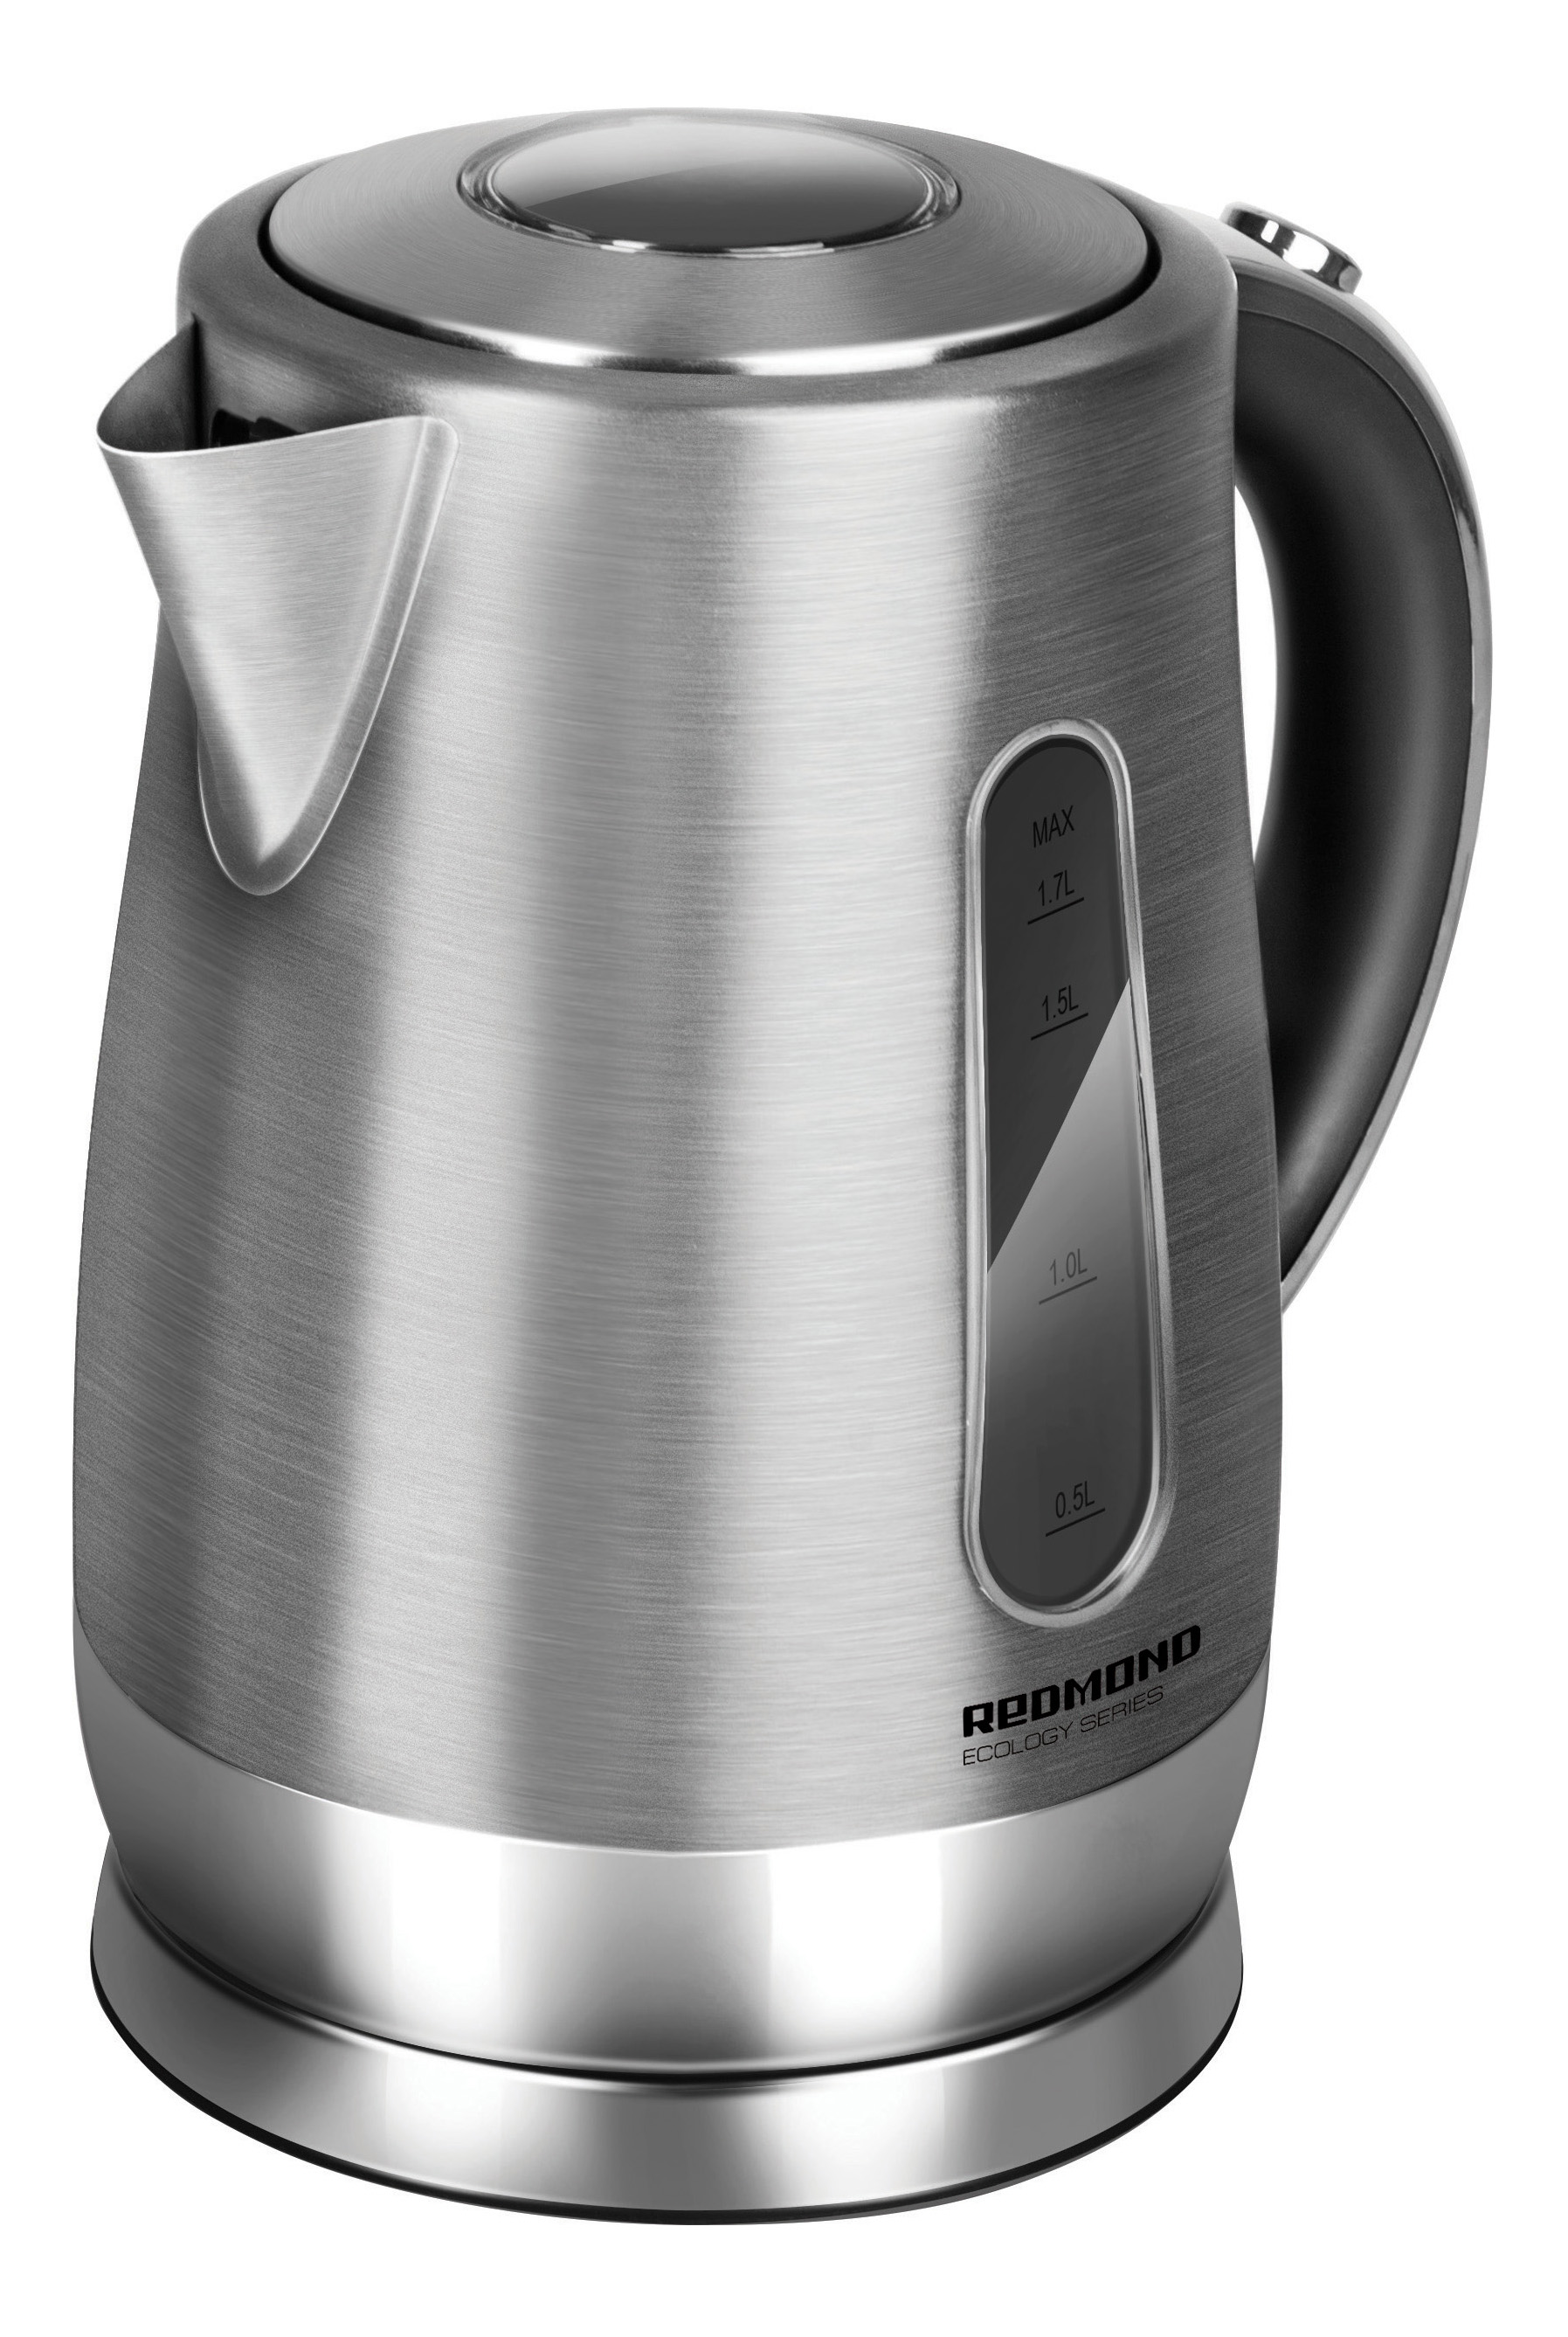 Чайник электрический Redmond RK-M153 Silver фото